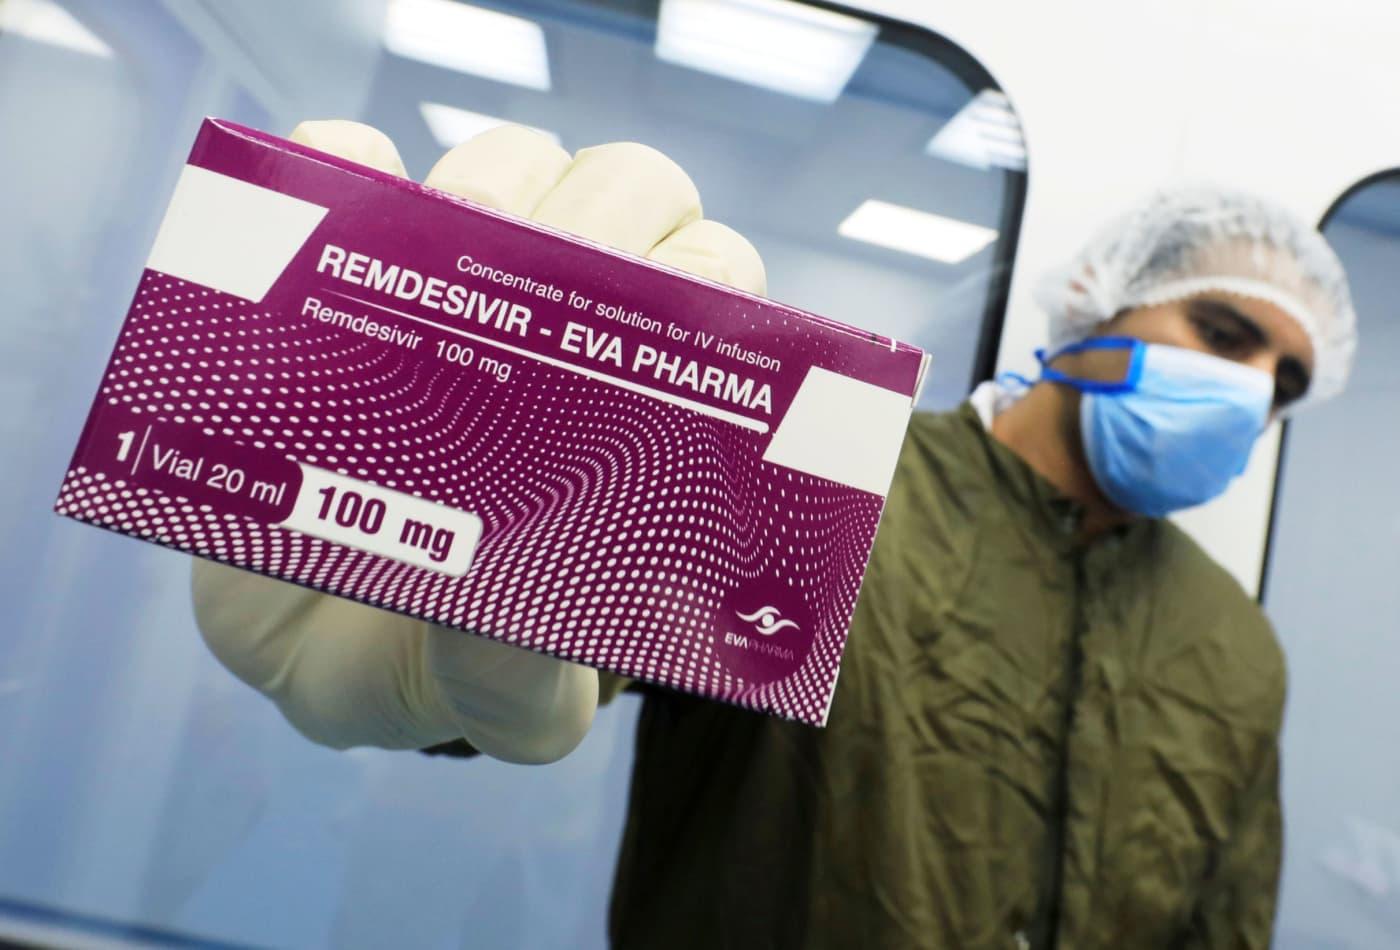 WHO tells doctors not to use Gilead's remdesivir as a coronavirus treatment, splitting with FDA